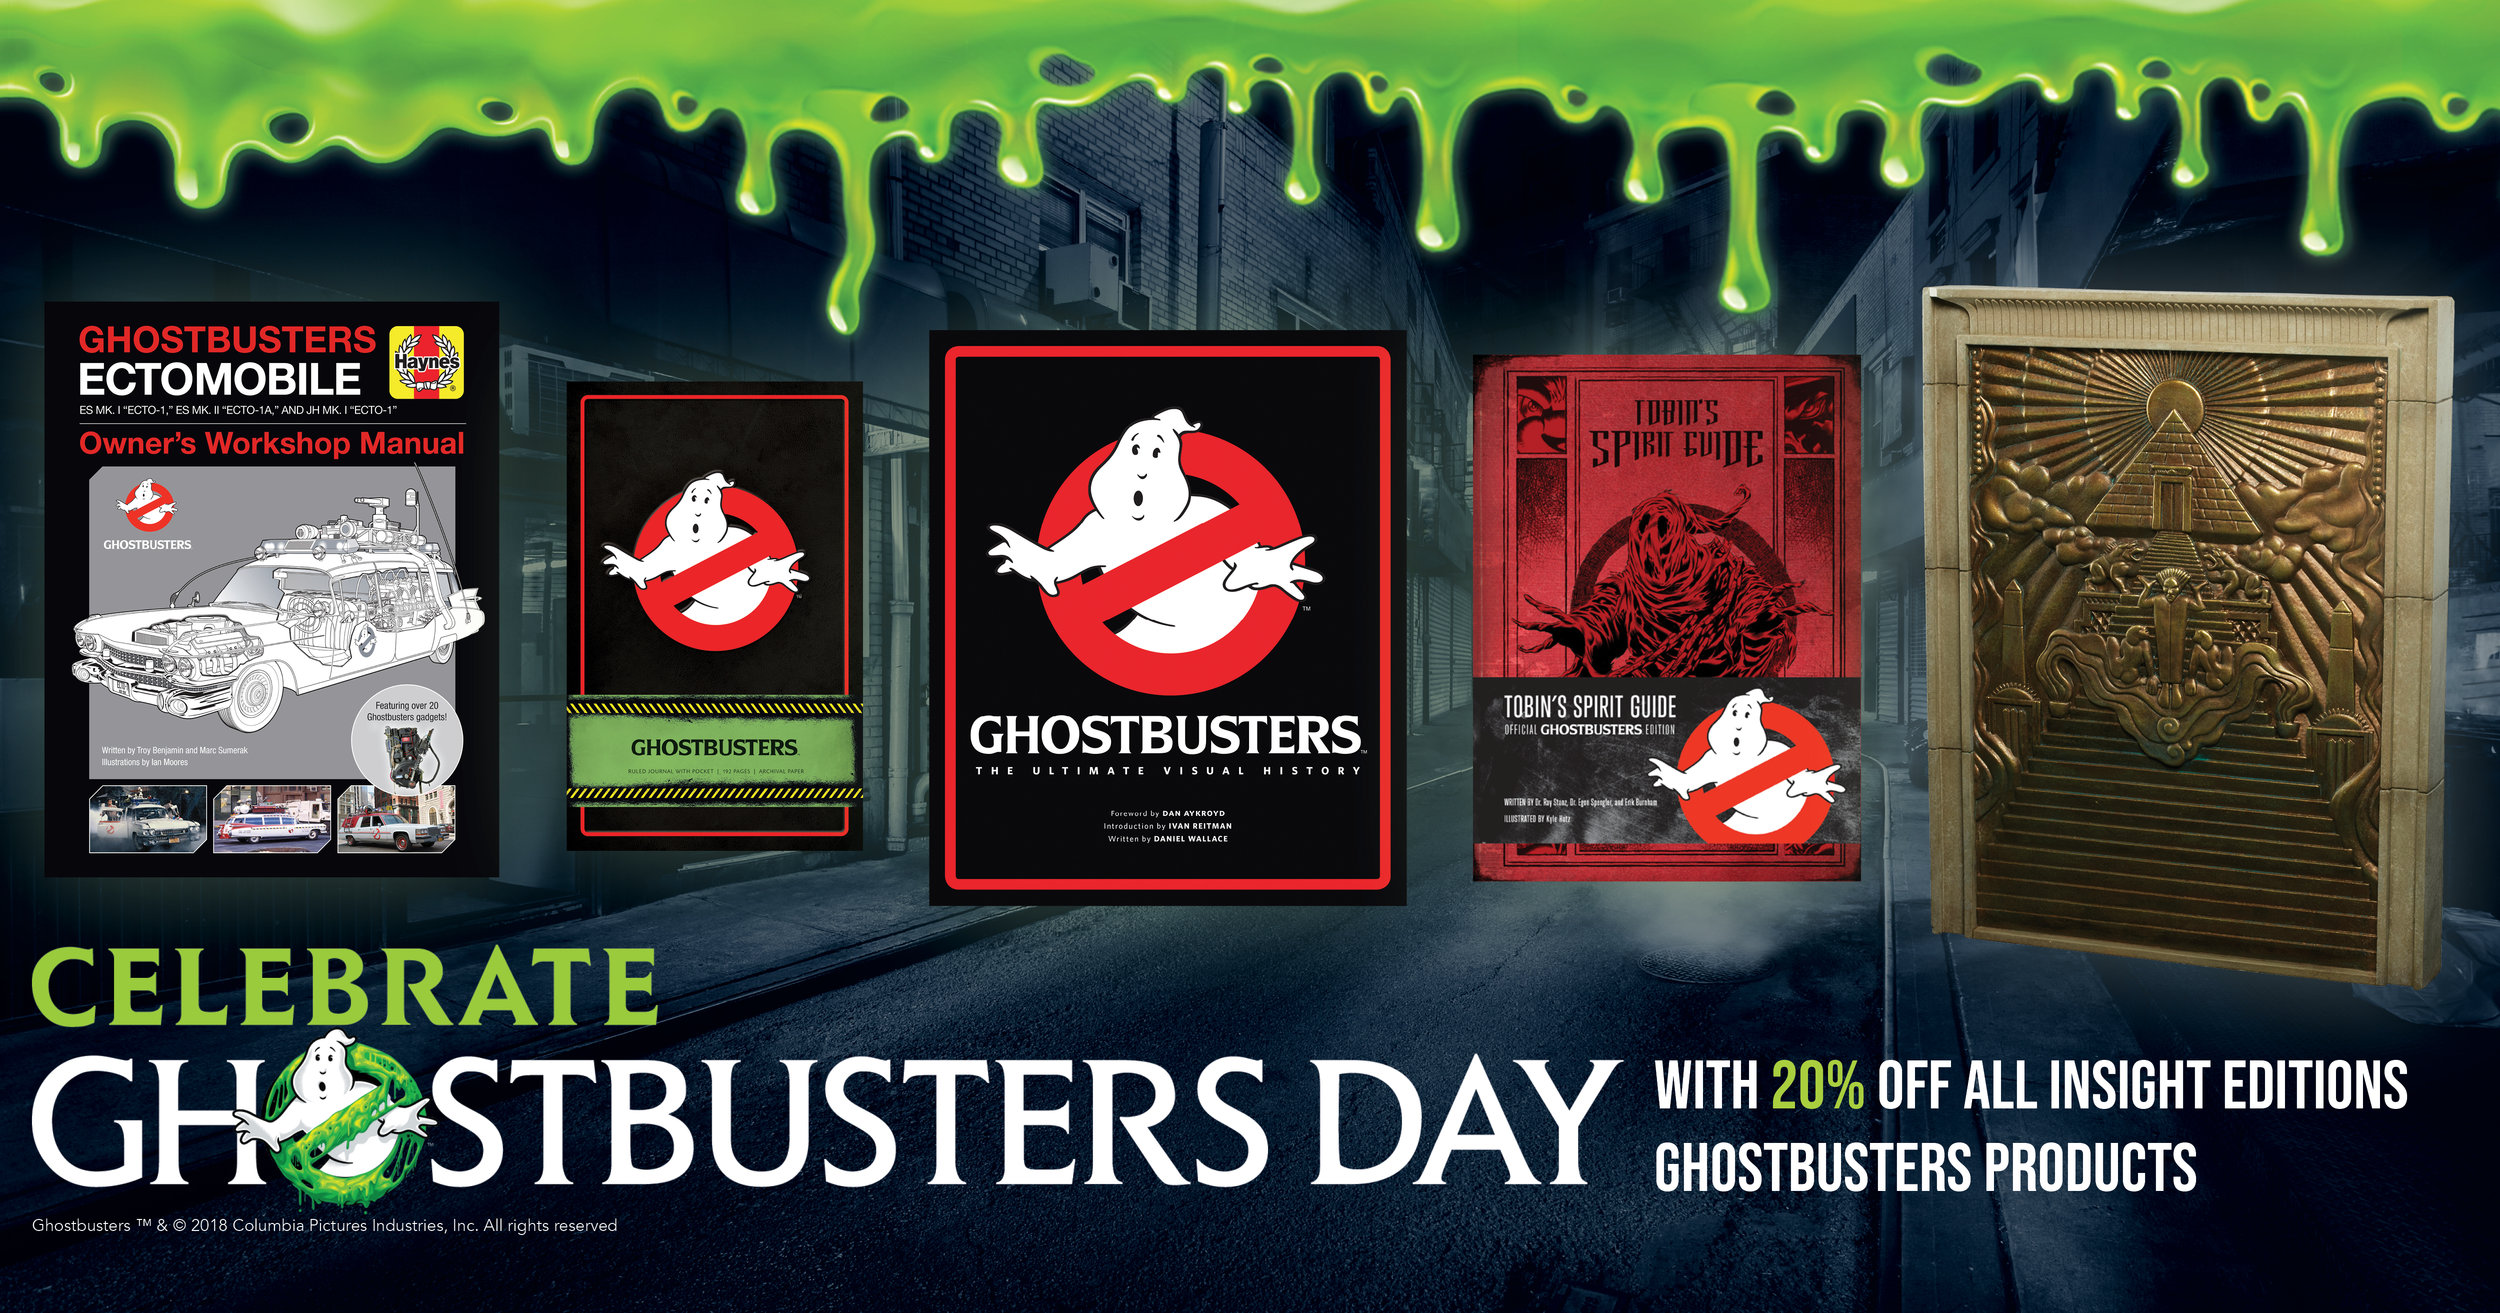 GhostBusters_DayFlashSale_SocialMedia_060418.jpg